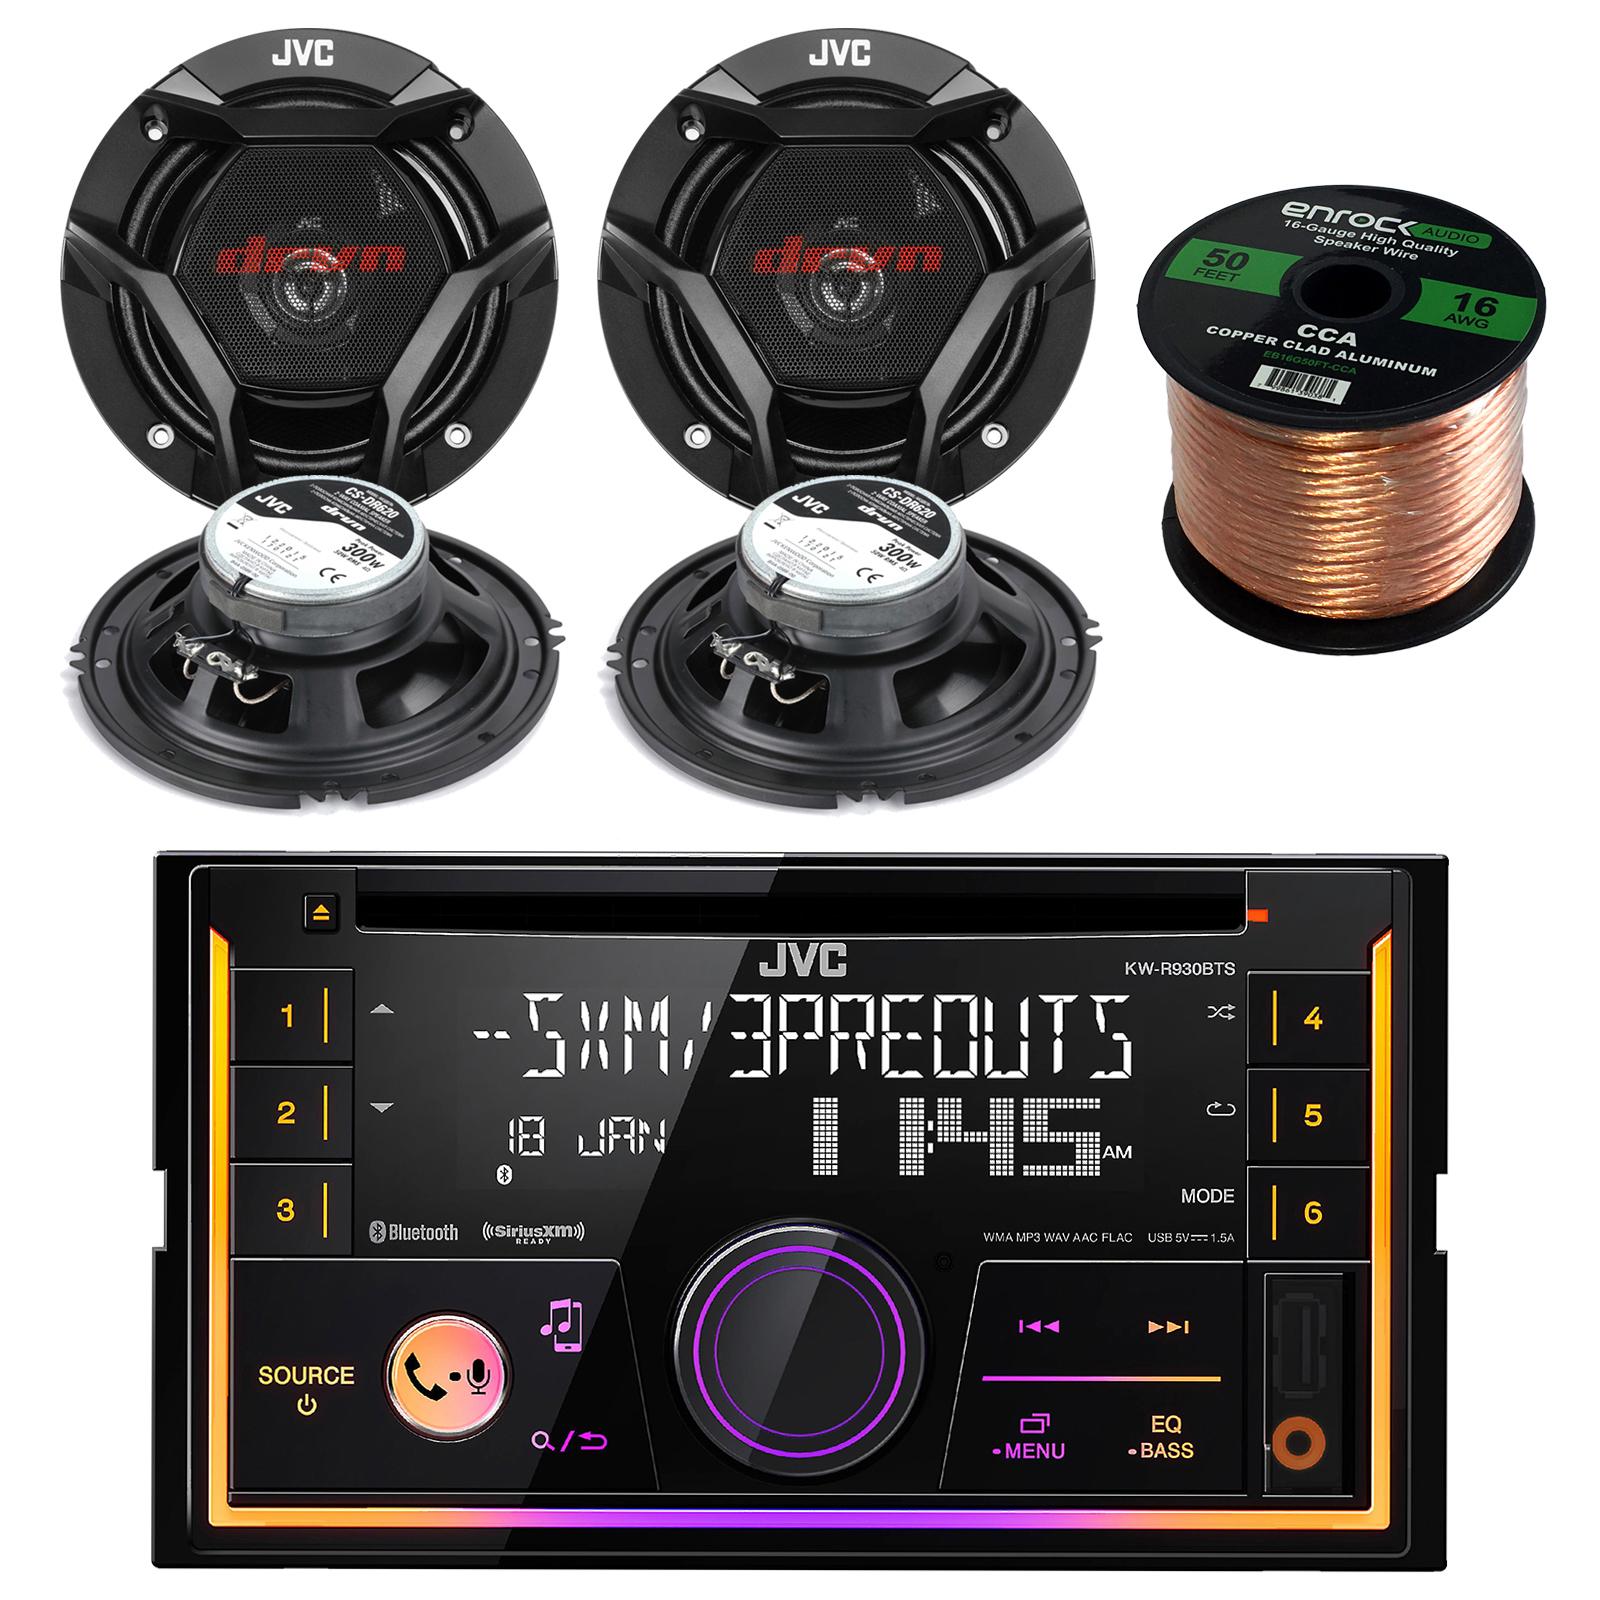 "JVC KWR930BTS Double DIN Bluetooth Car Stereo Receiver Bundle Combo With 4x JVC CS-DR620 6.5"" Inch 300-Watt 2-Way Audio Coaxial Speakers + Enrock 50 Foot 16 Gauge Speaker Wire"